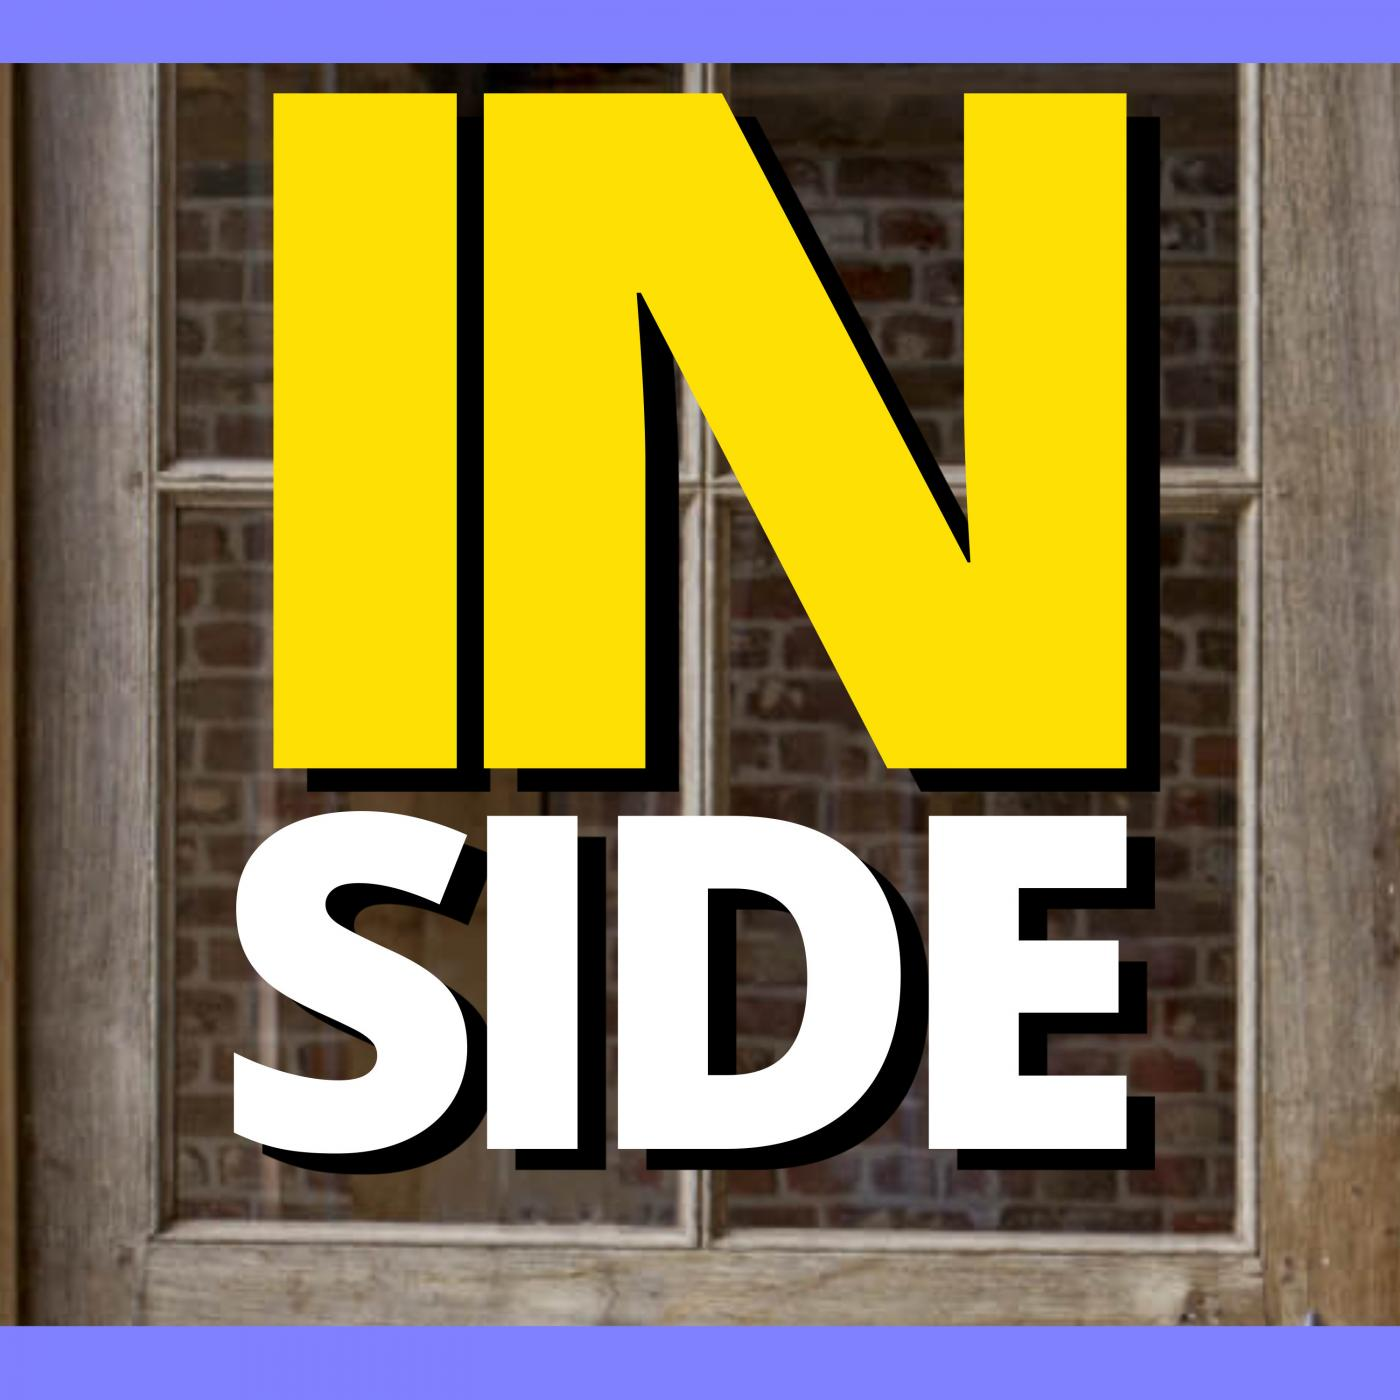 Podcast Inside logo